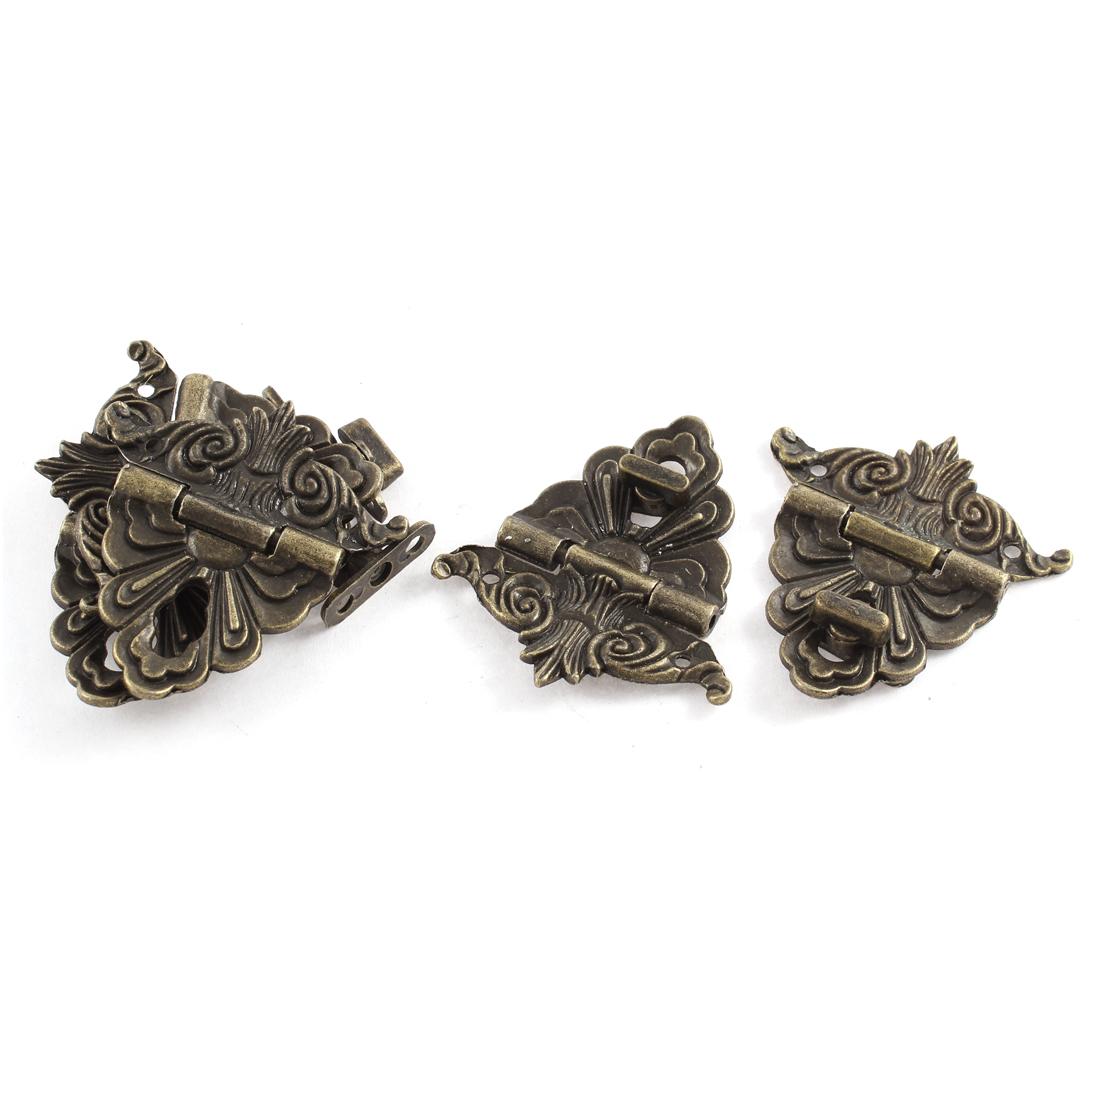 5pcs 59mmx55mm Retro Style Bronze Tone Jewelry Box Drawer Decorative Hasp Lock Latch